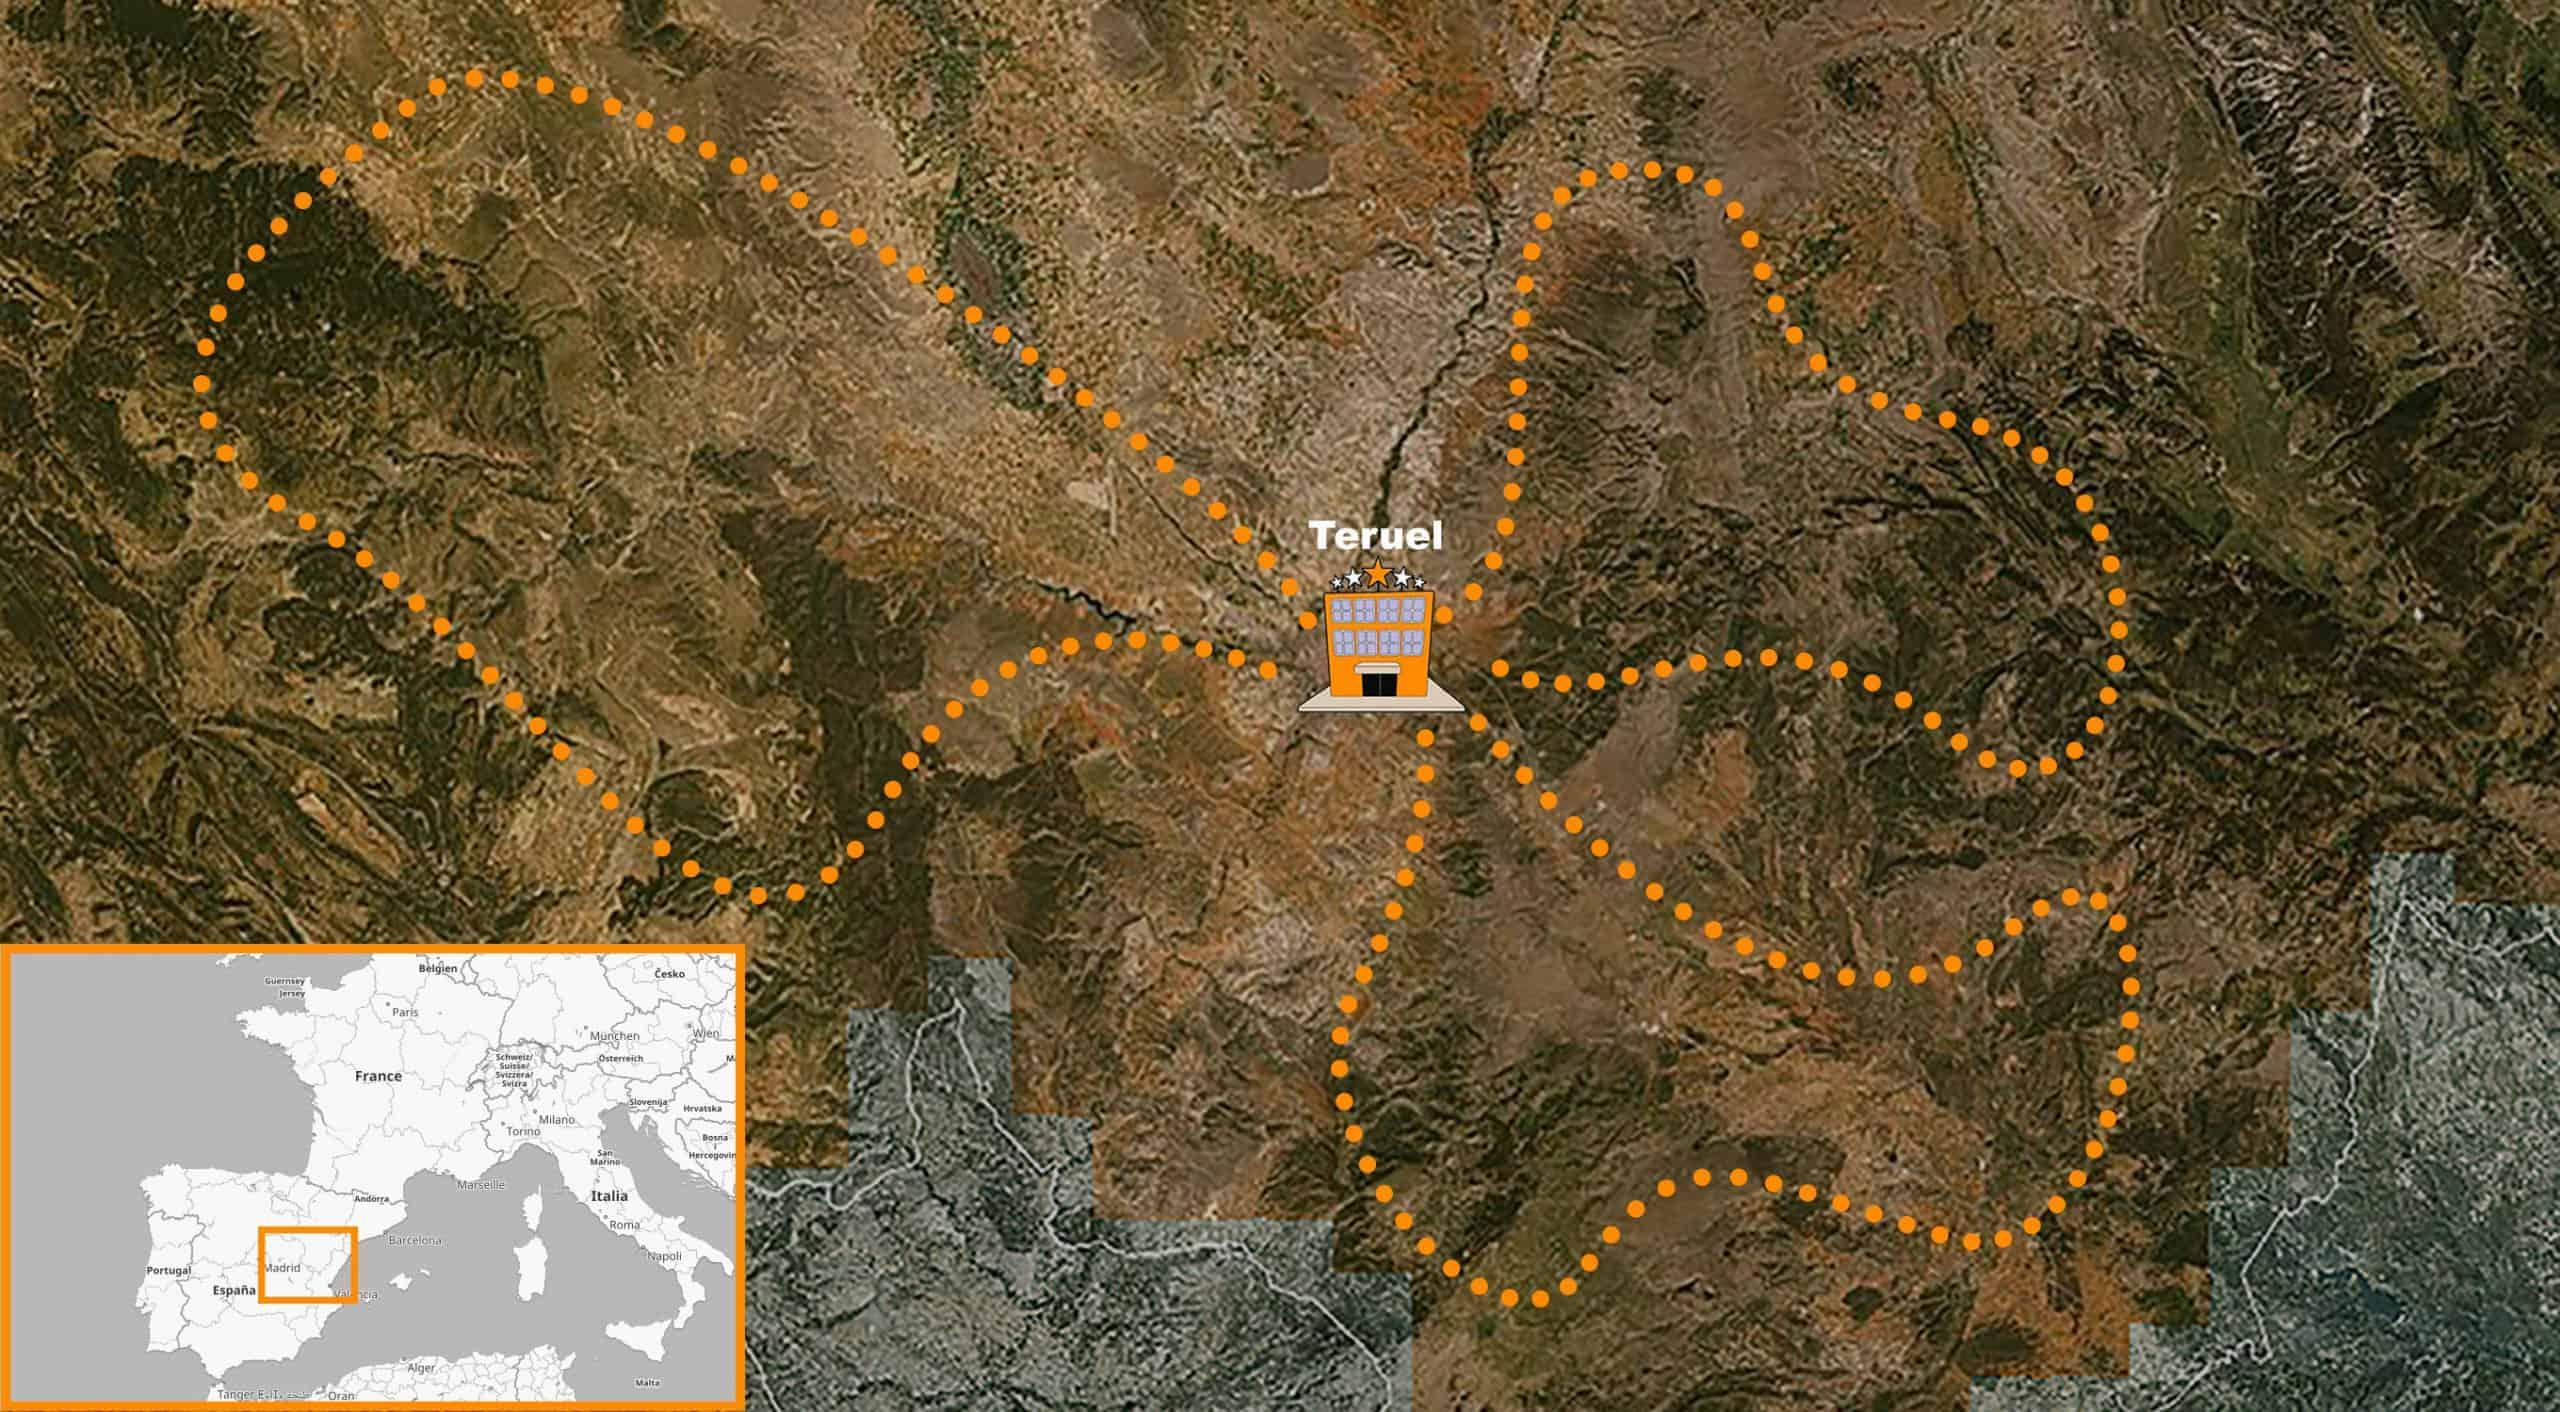 itinerario Viaje organizado en moto Trail por España Teruel